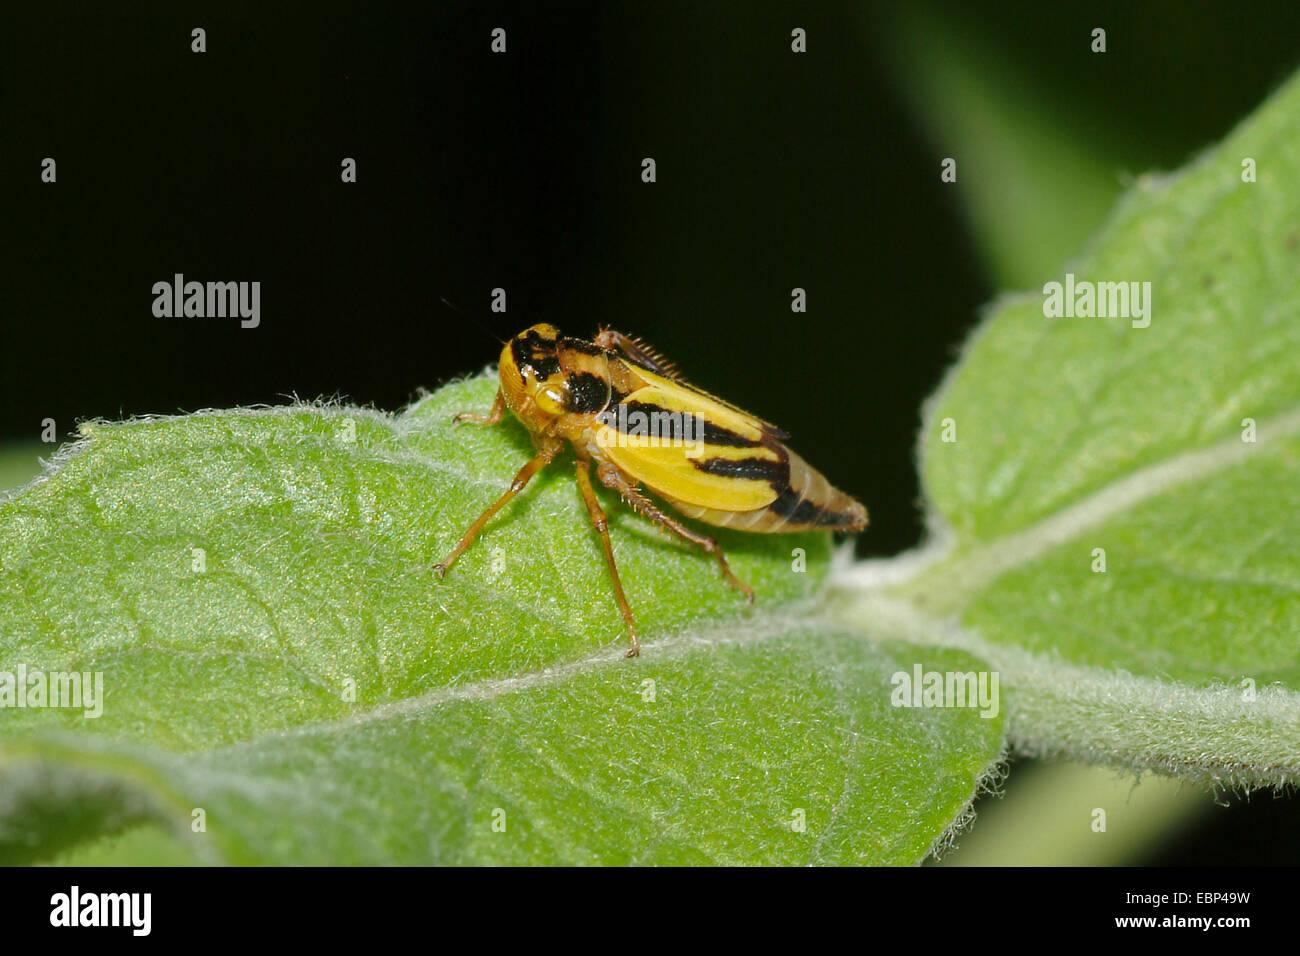 hop leafhopper (Evacanthus interruptus), on a leaf, Germany - Stock Image